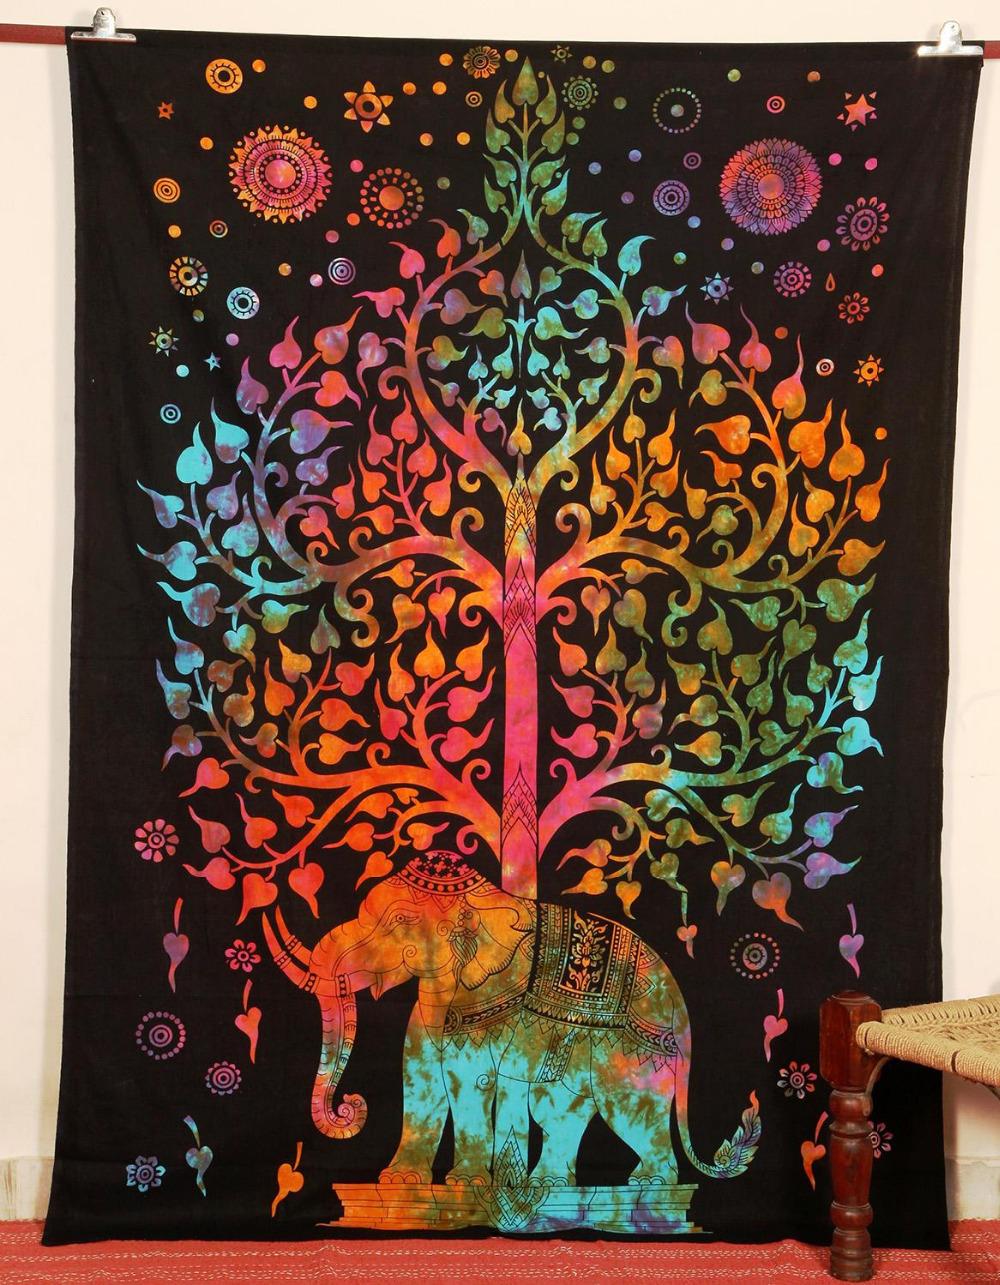 Com buy indian tapestry elephant under tree mandala wall hanging